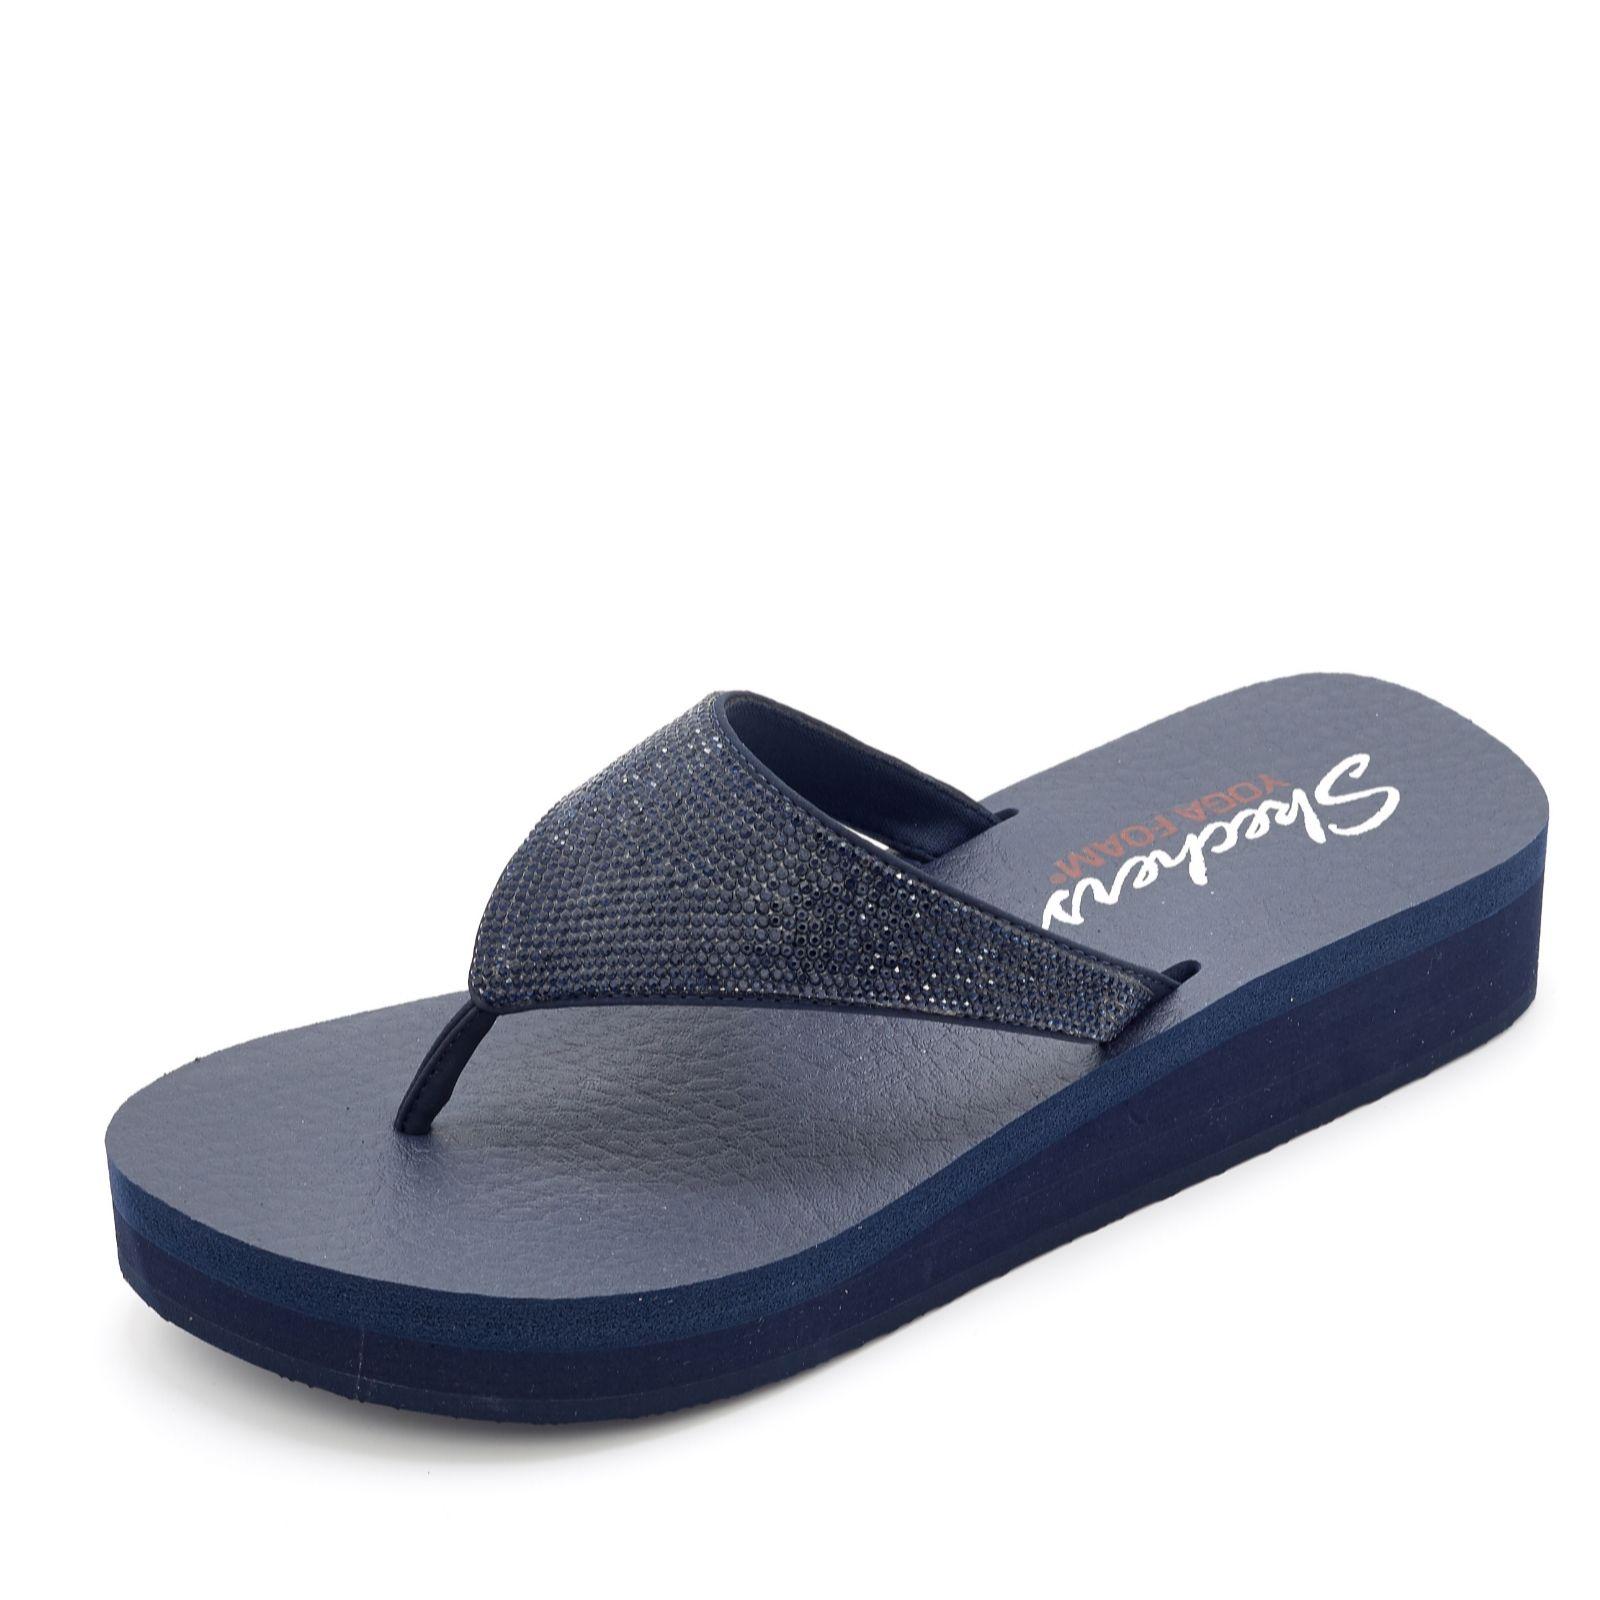 29985c3c27cf Skechers Vinyasa Nam On Rhinestone Flip Flop with Yoga Foam ...